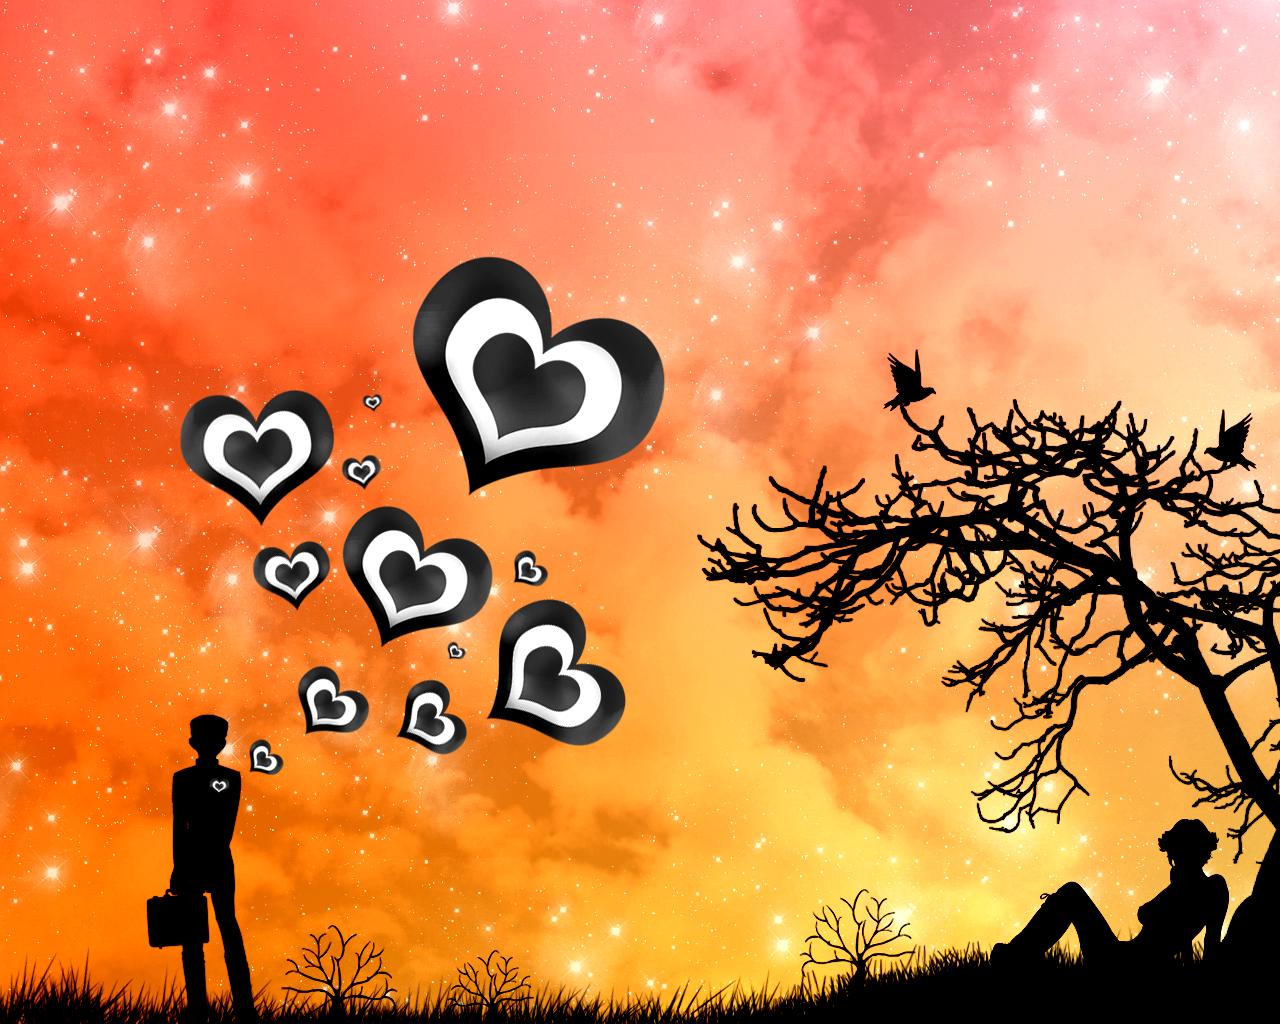 Love wallpapers hd wallpapers screensavers - E love hd wallpaper ...